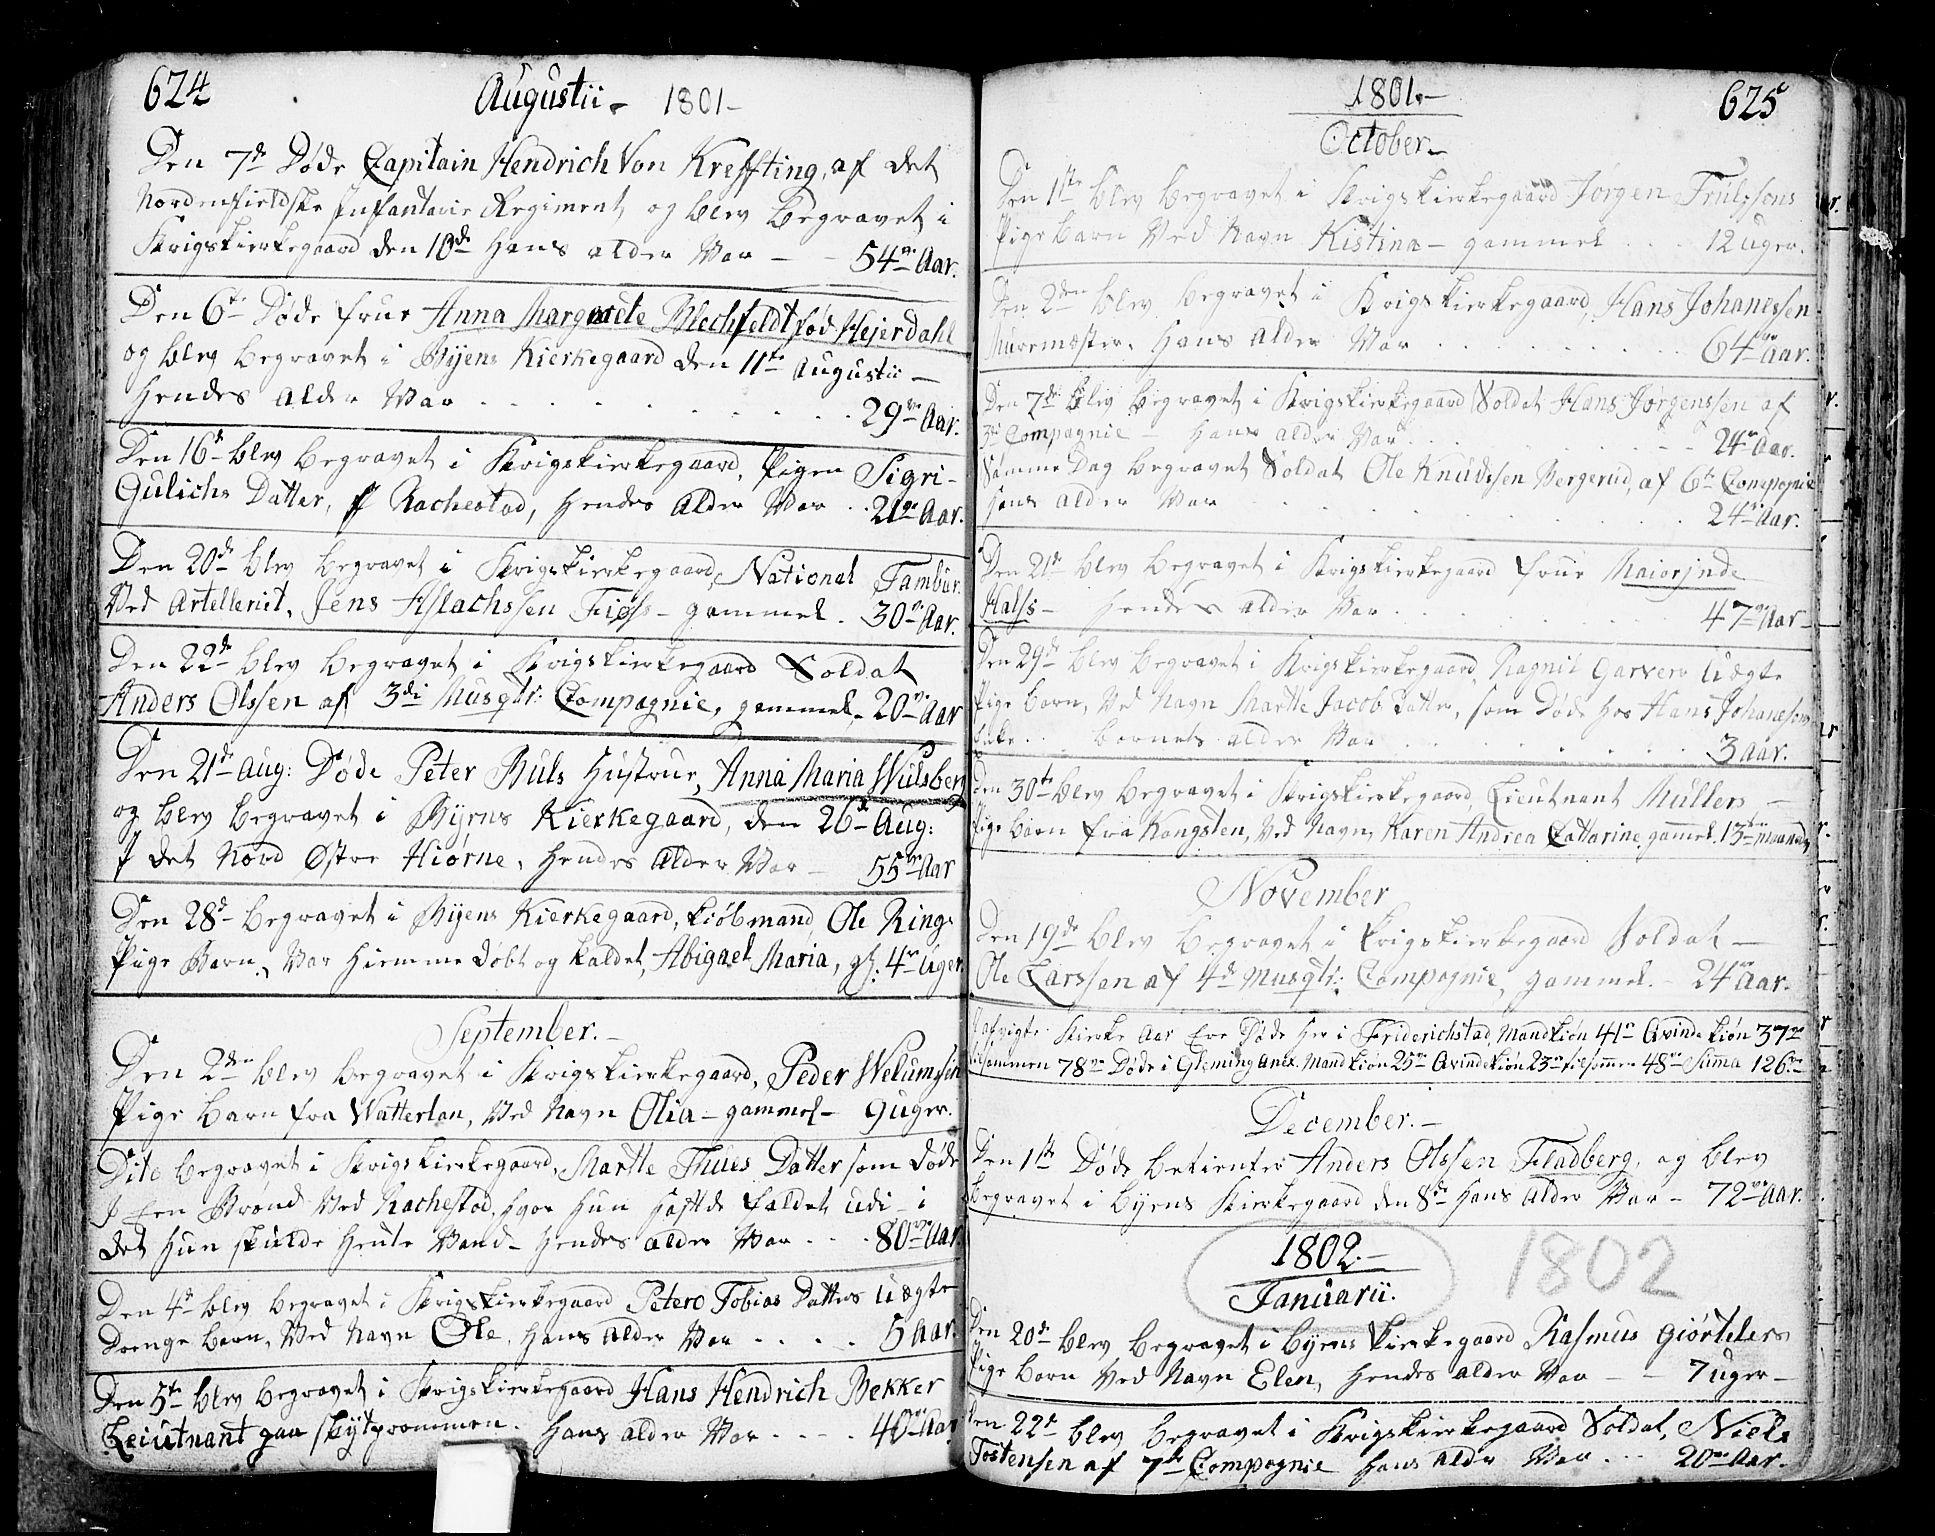 SAO, Fredrikstad prestekontor Kirkebøker, F/Fa/L0002: Ministerialbok nr. 2, 1750-1804, s. 624-625